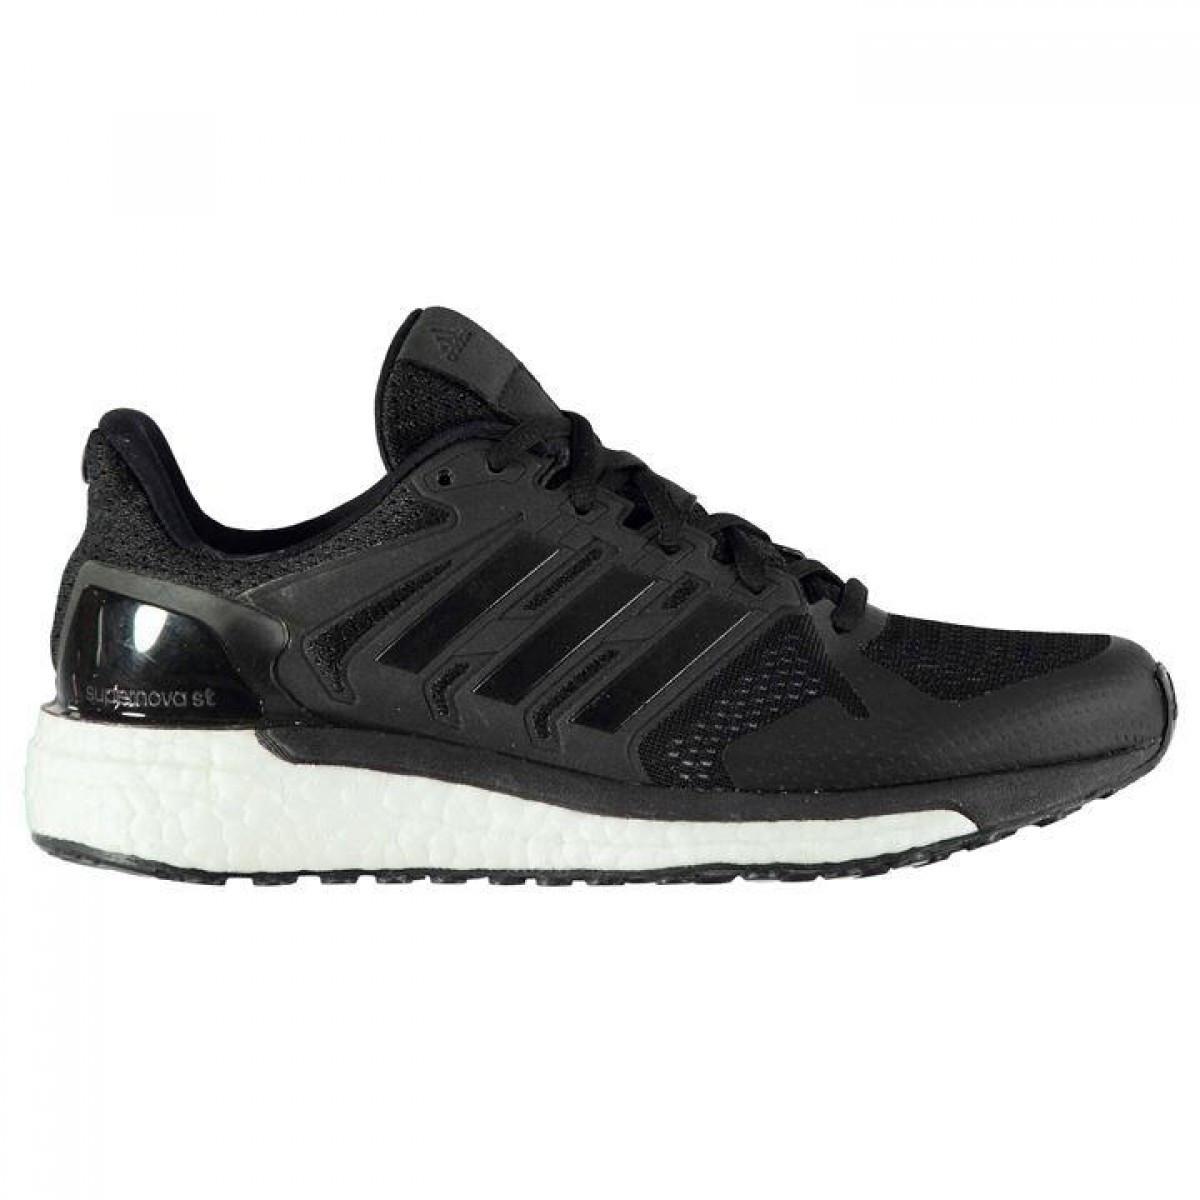 Кроссовки Adidas Supernova ST Ladies Black/White - Оригинал, фото 1